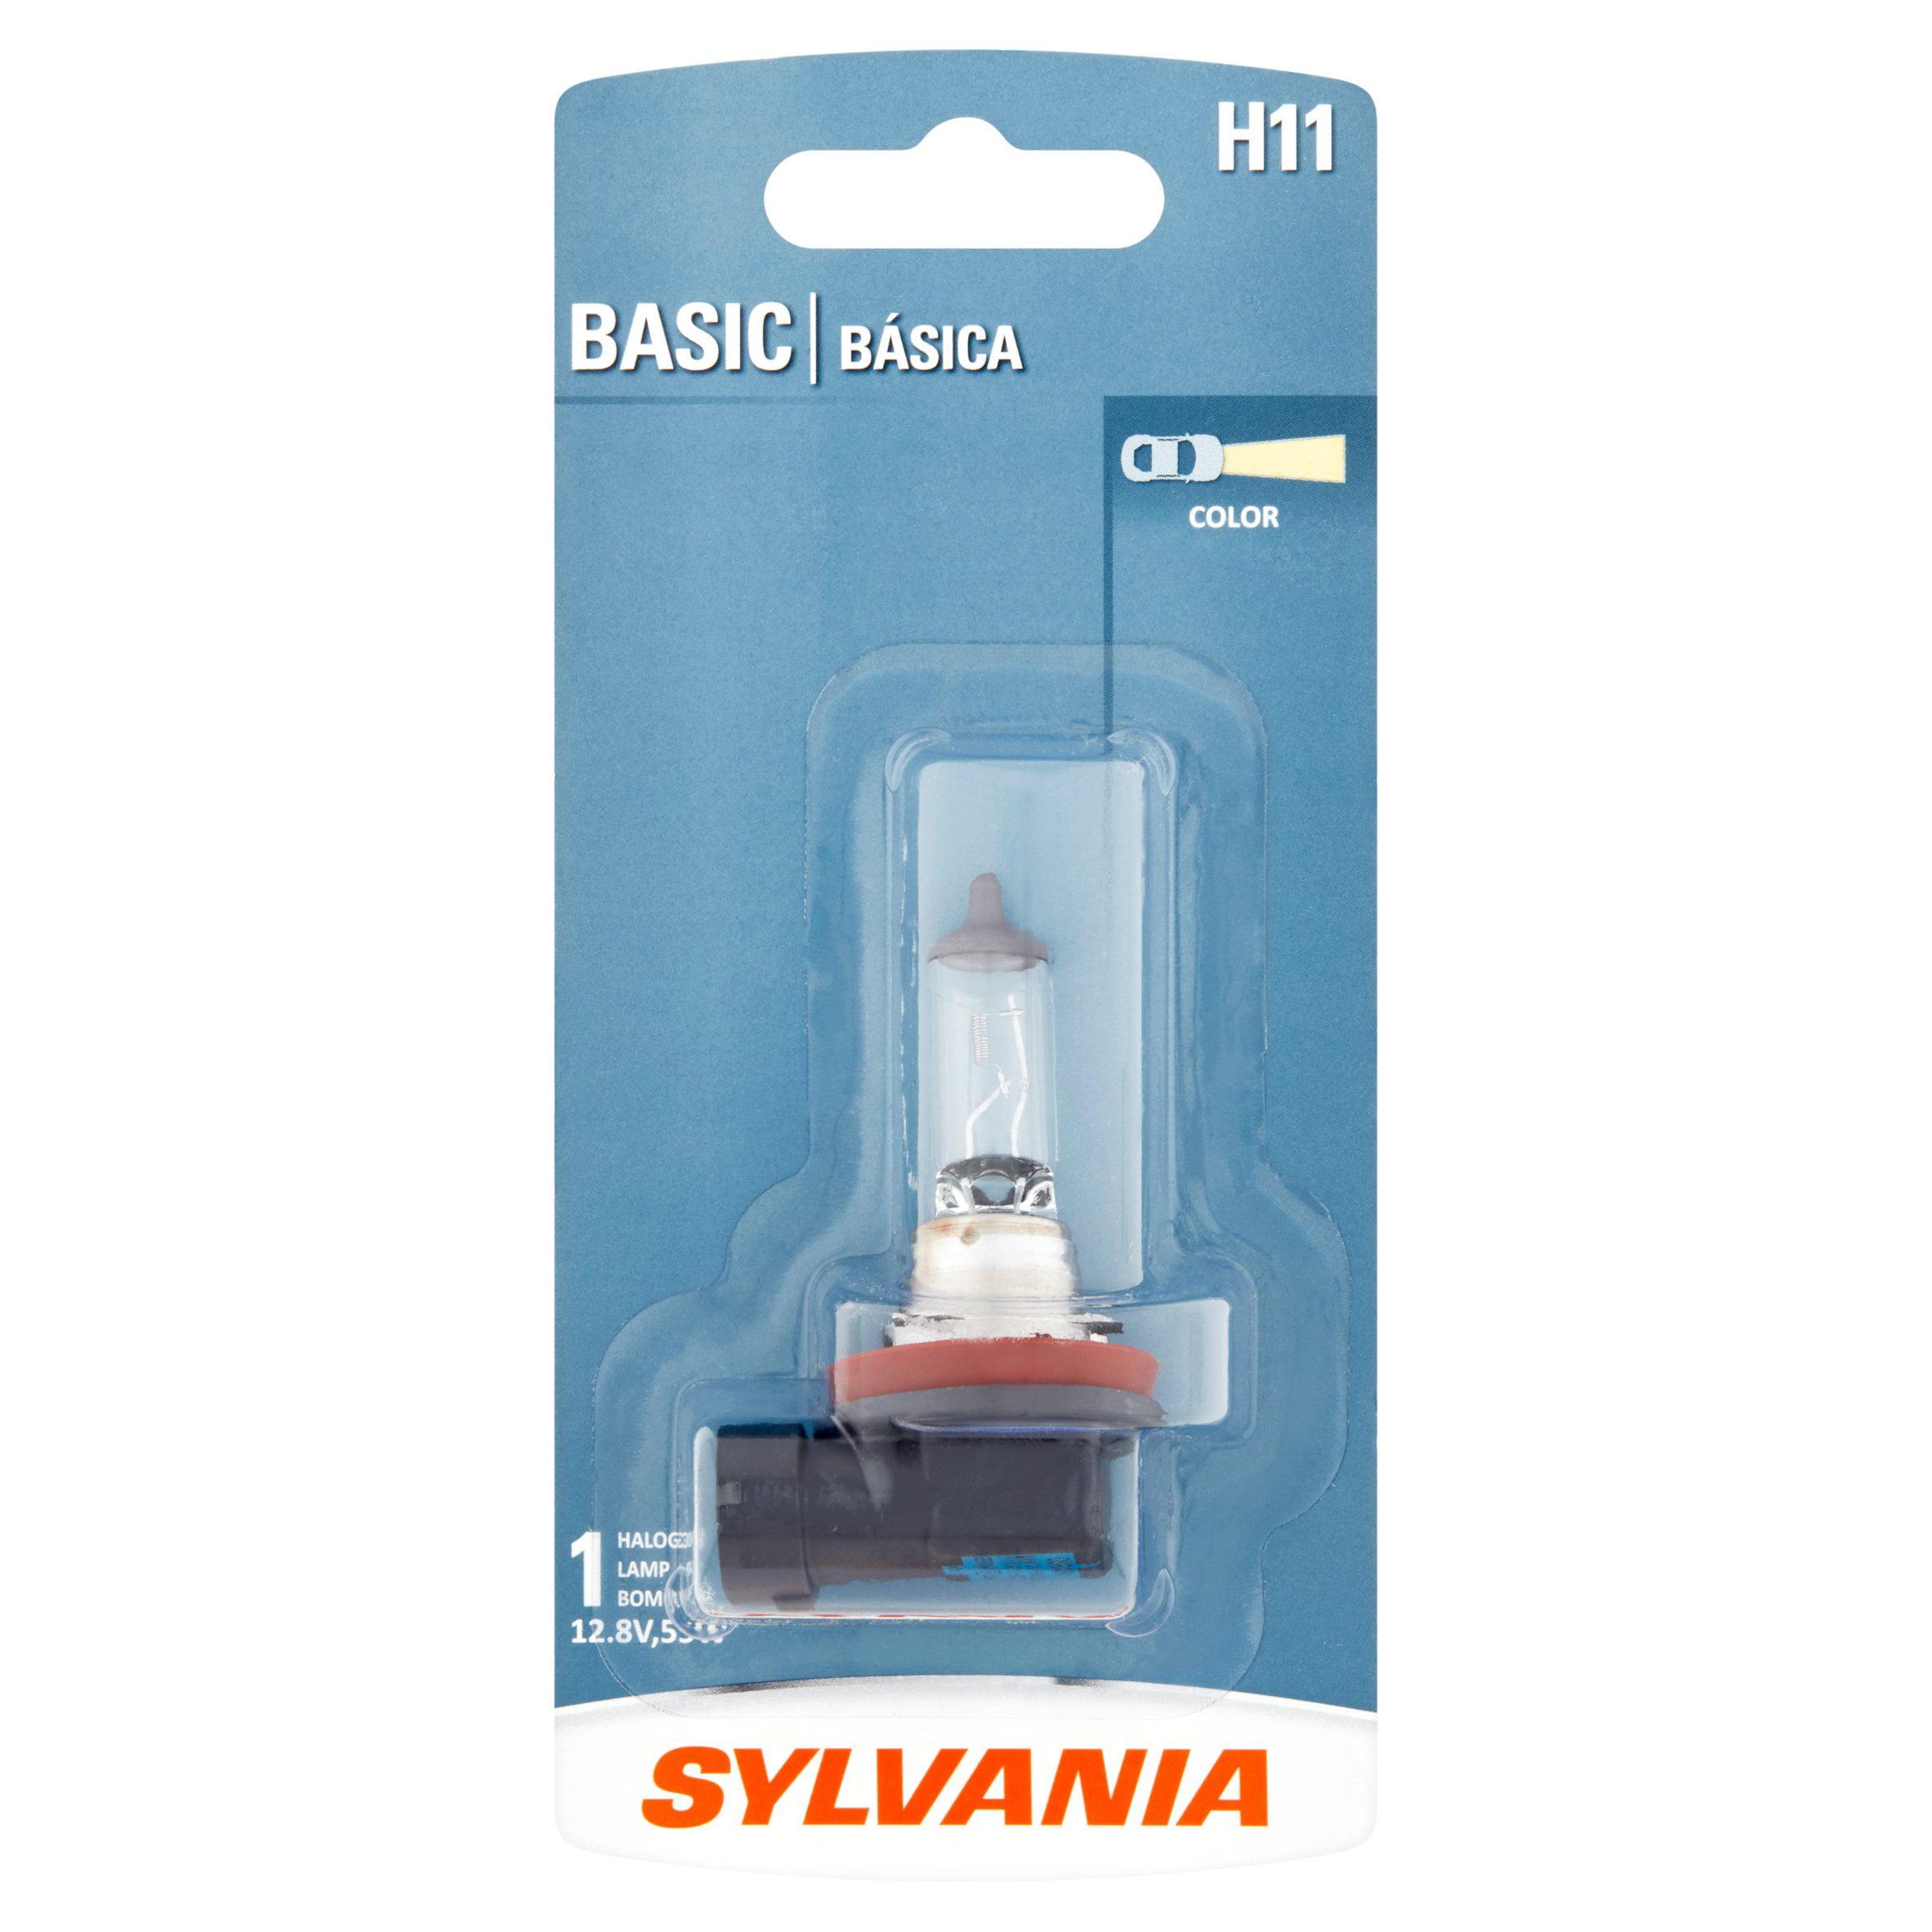 Sylvania 55W H11 Basic Halogen Lamp